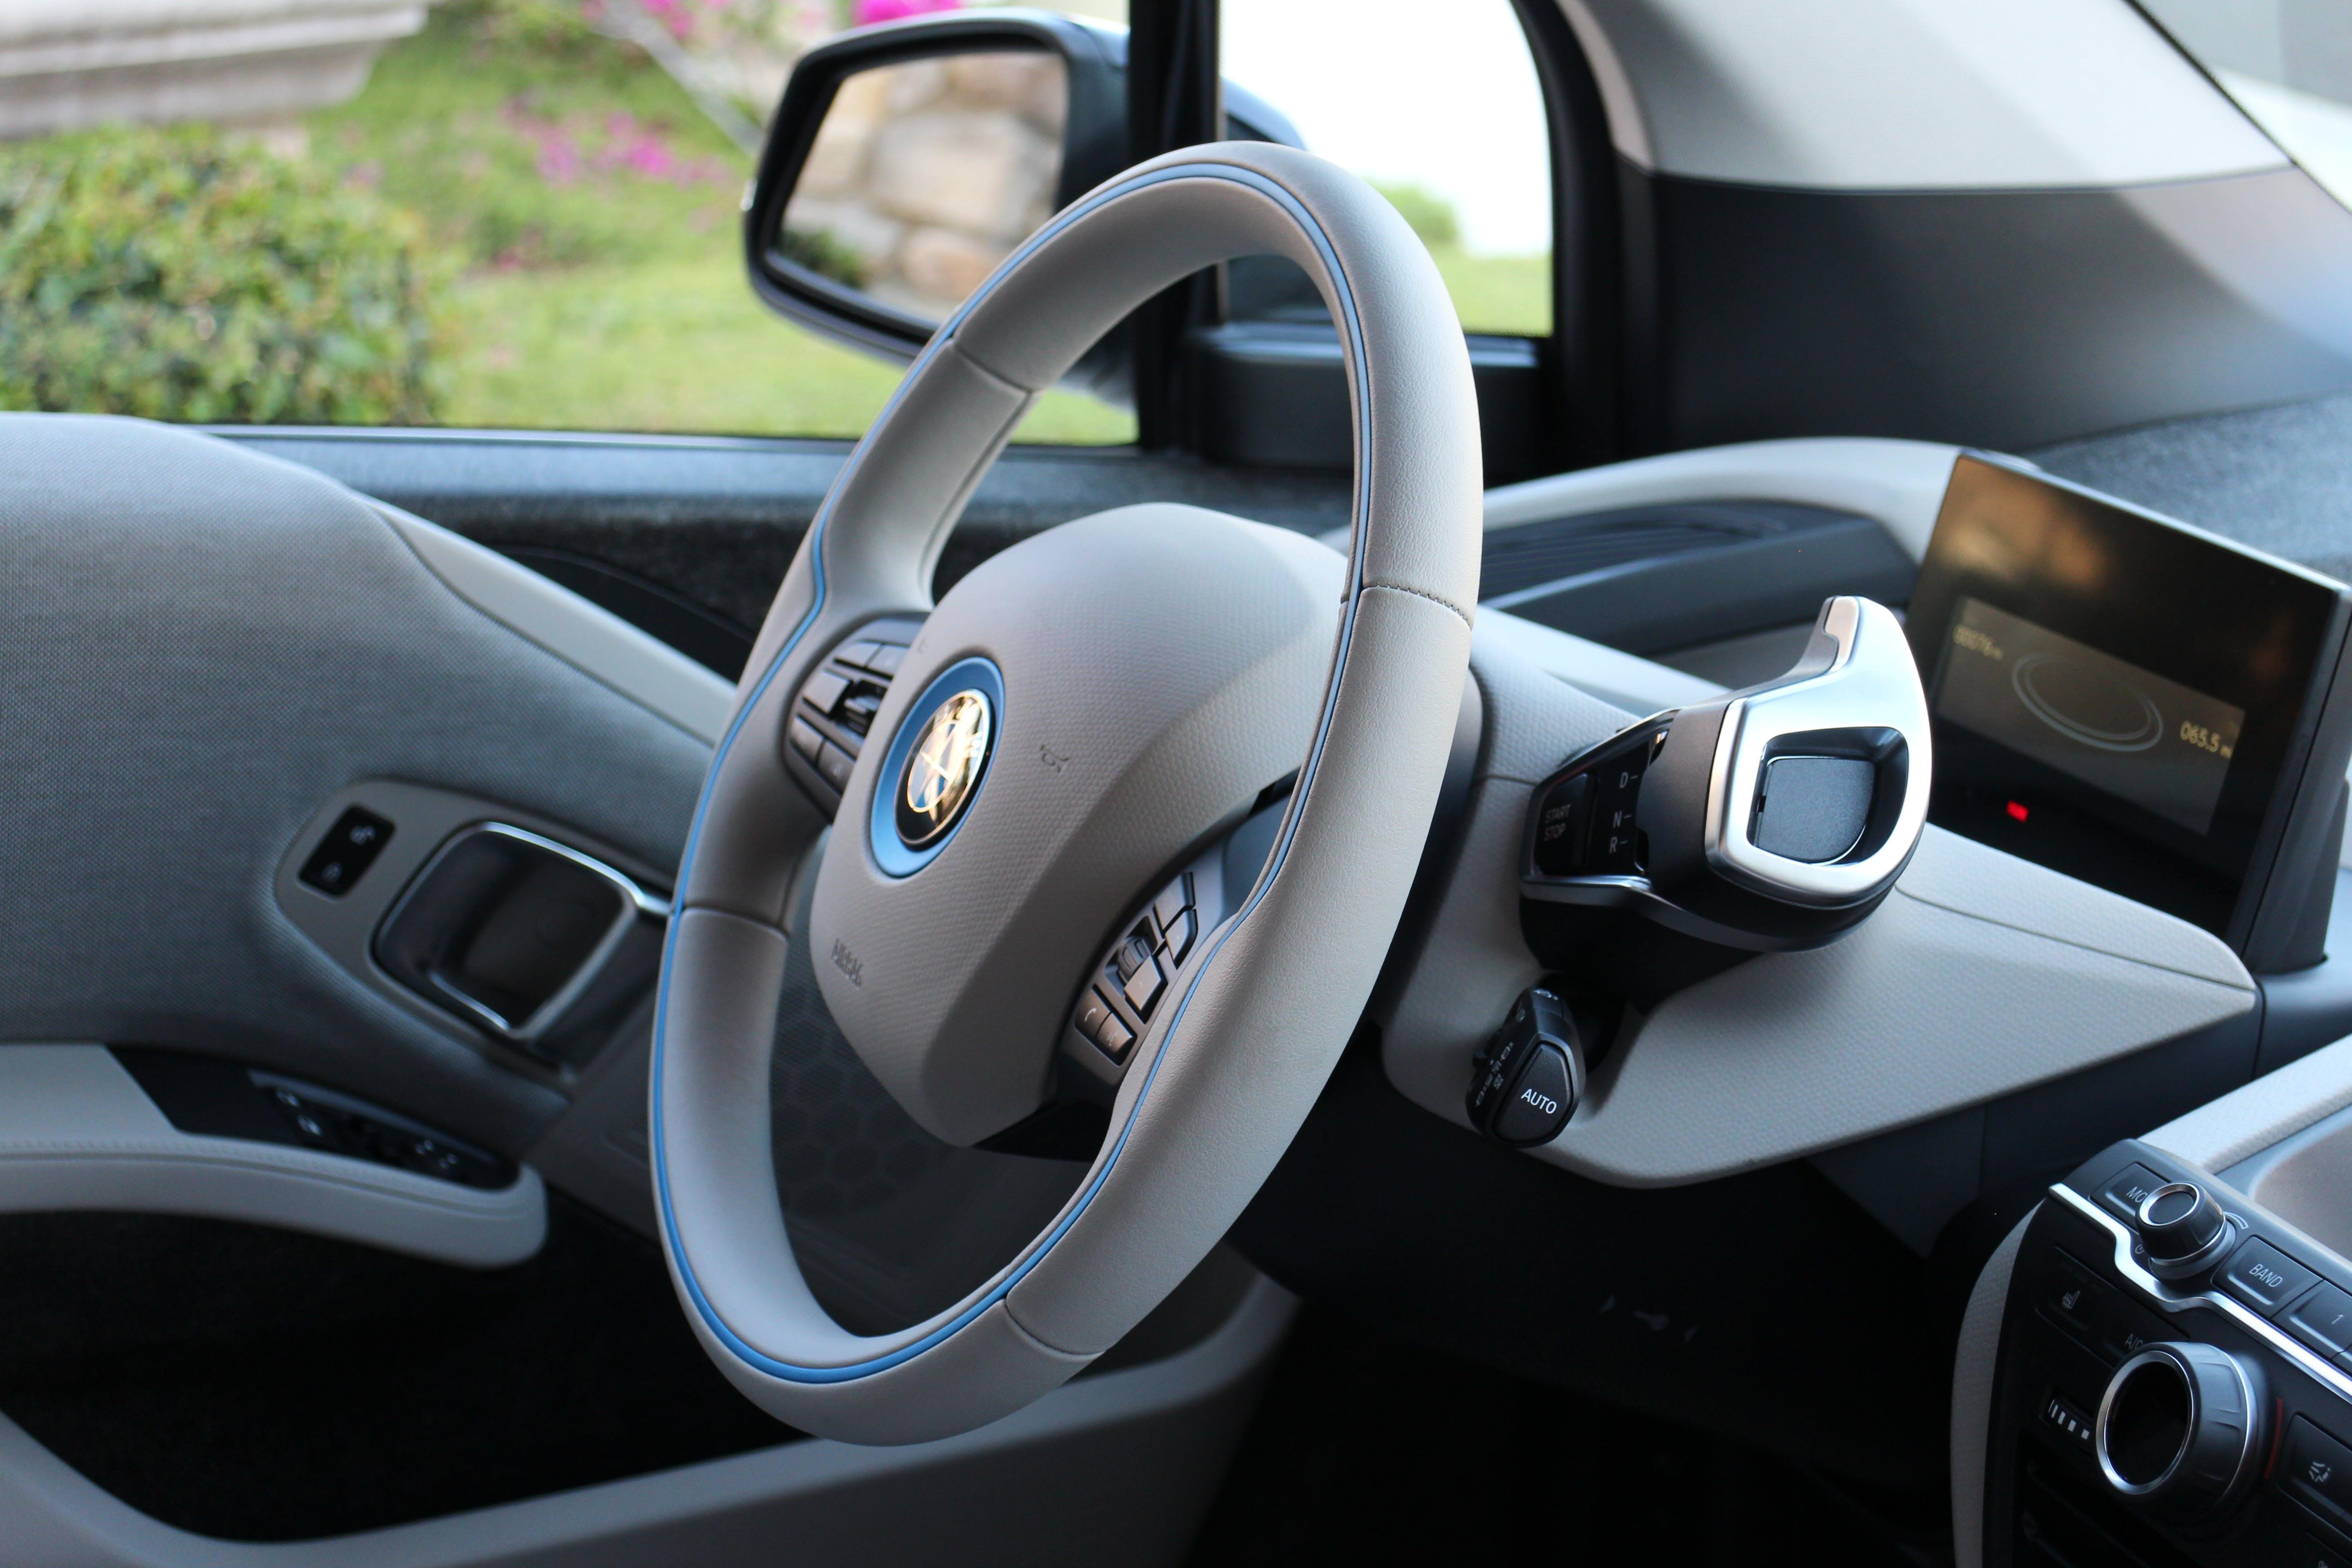 Free stock photo of car, interior, sedan, electric